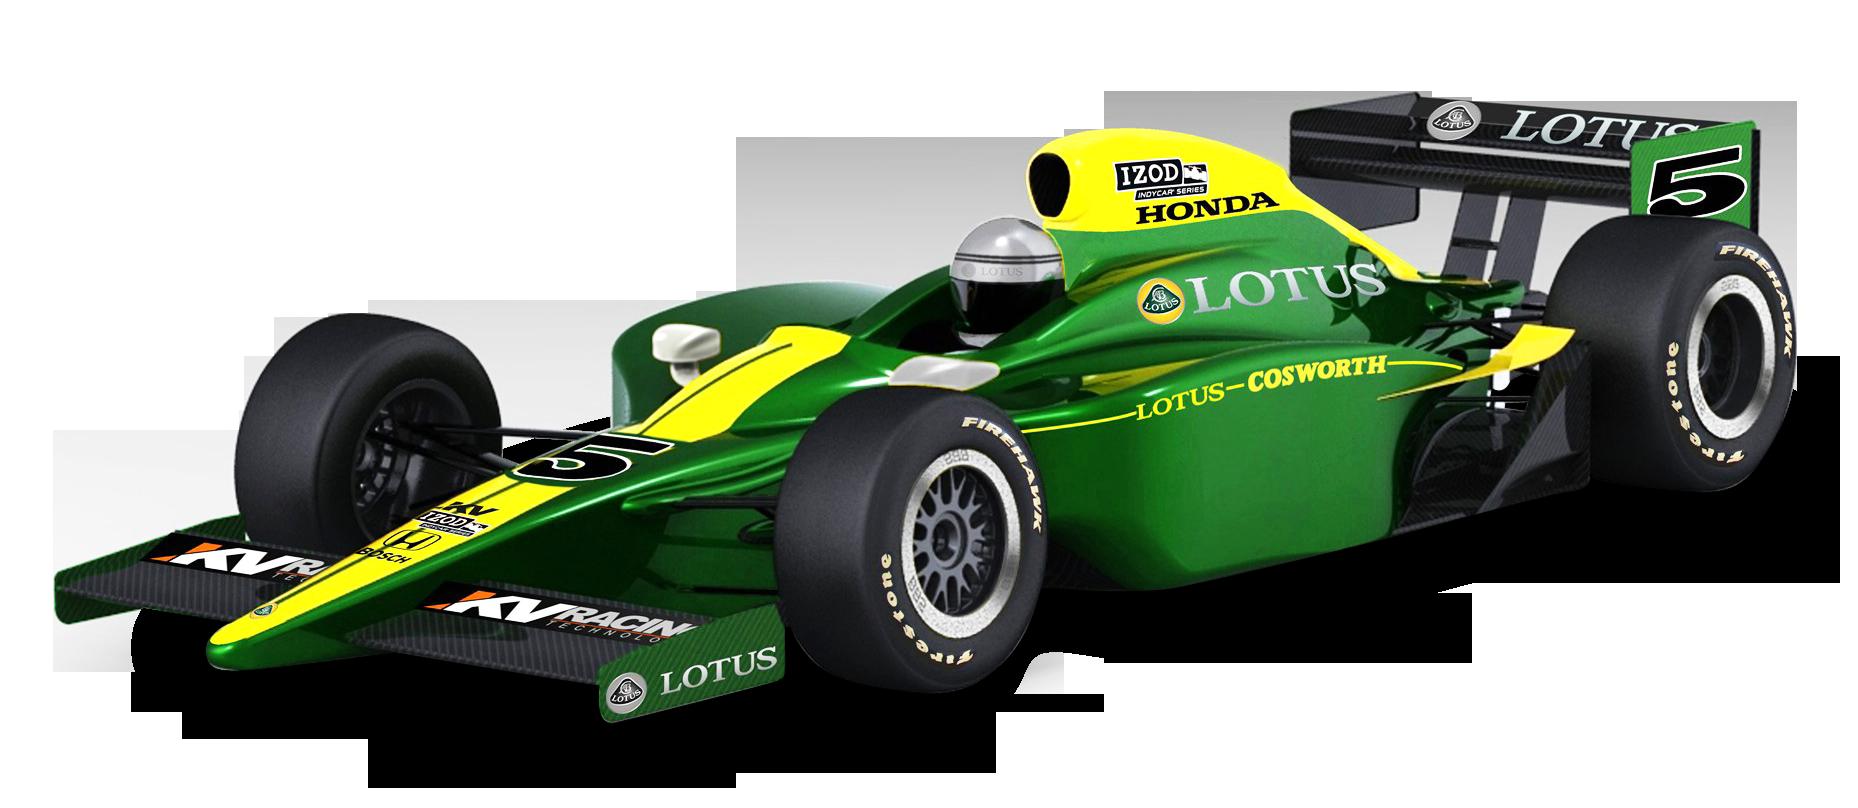 Race clipart motorsport. Green lotus cosworth racing